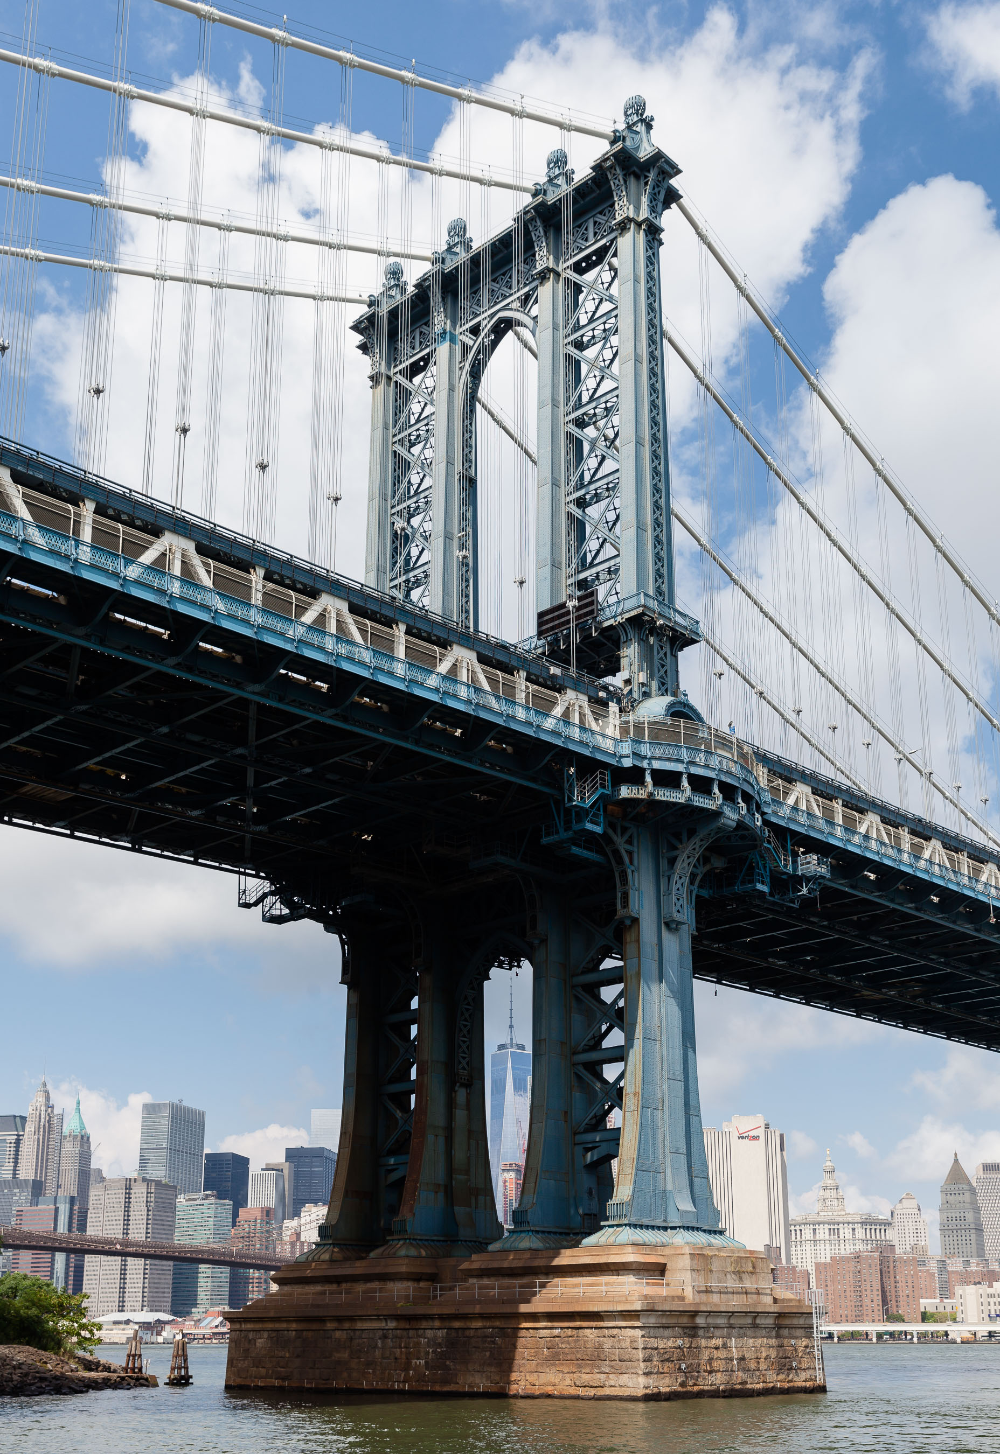 The Other Great Bridge Of Brooklyn Brooklyn Bridge Park Brooklyn Bridge Brooklyn Bridge Park New York Bridge